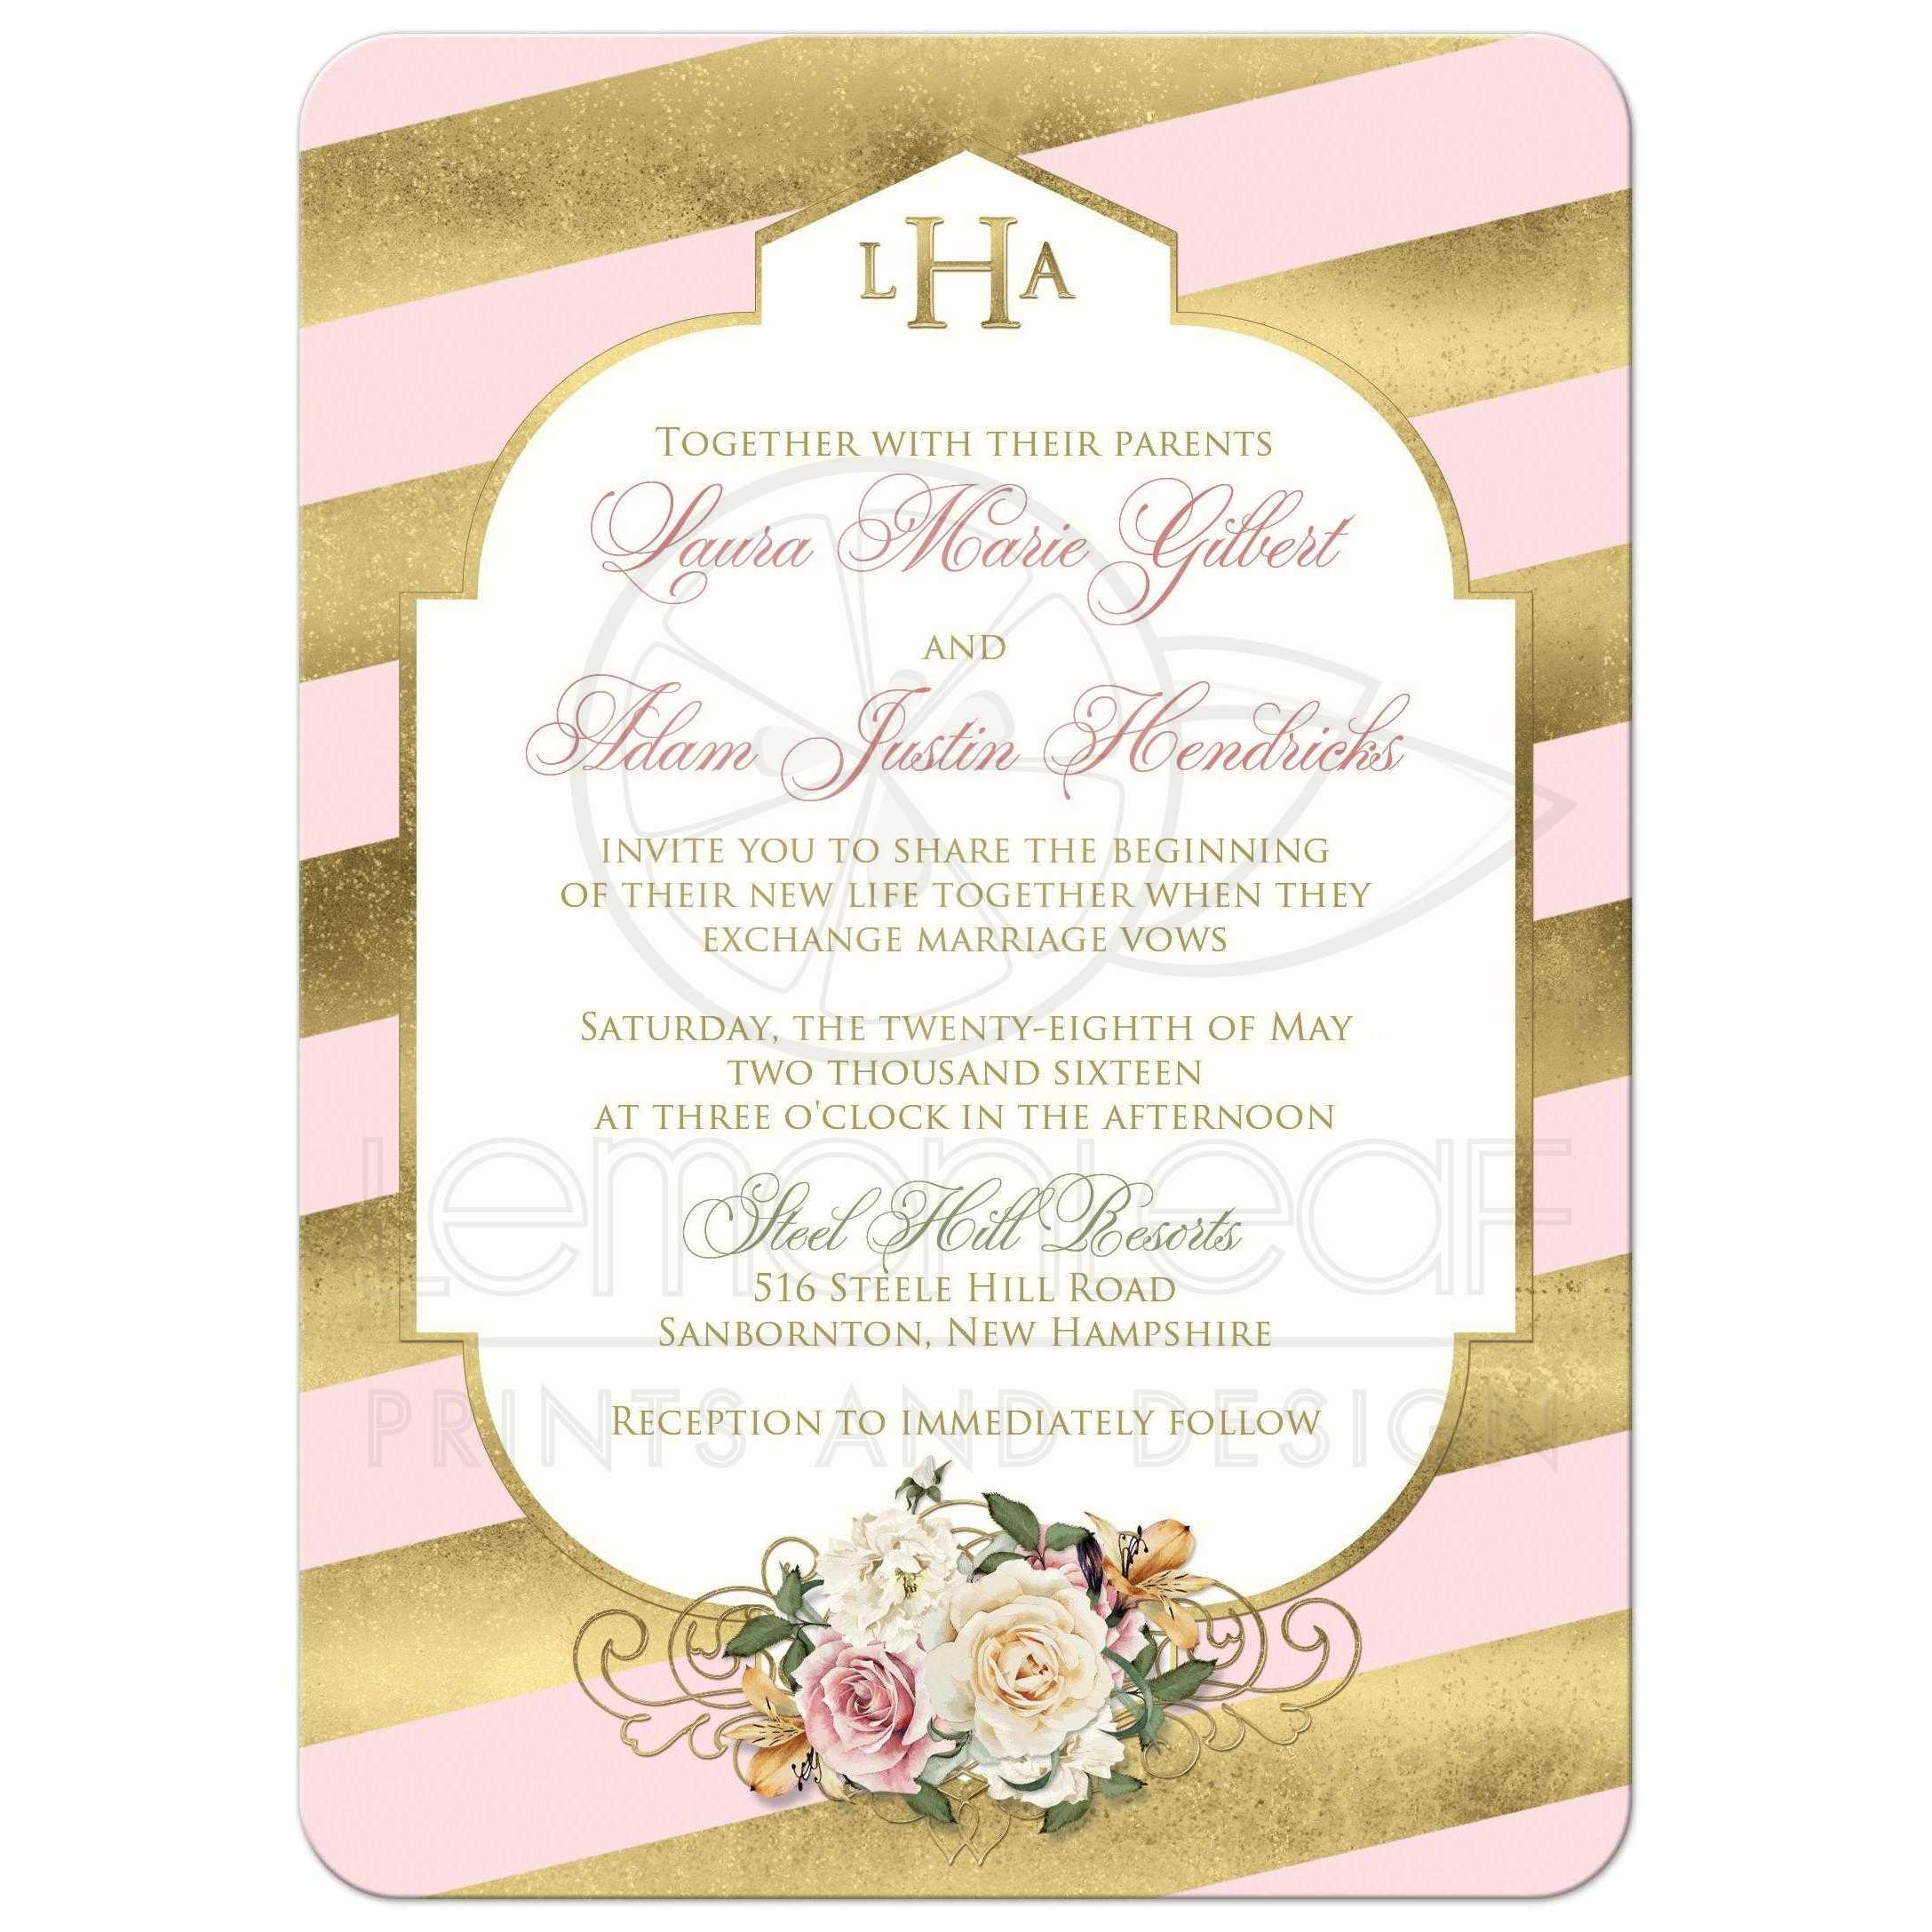 Monogrammed Wedding Invitation Blush Pink Faux Gold Scroll